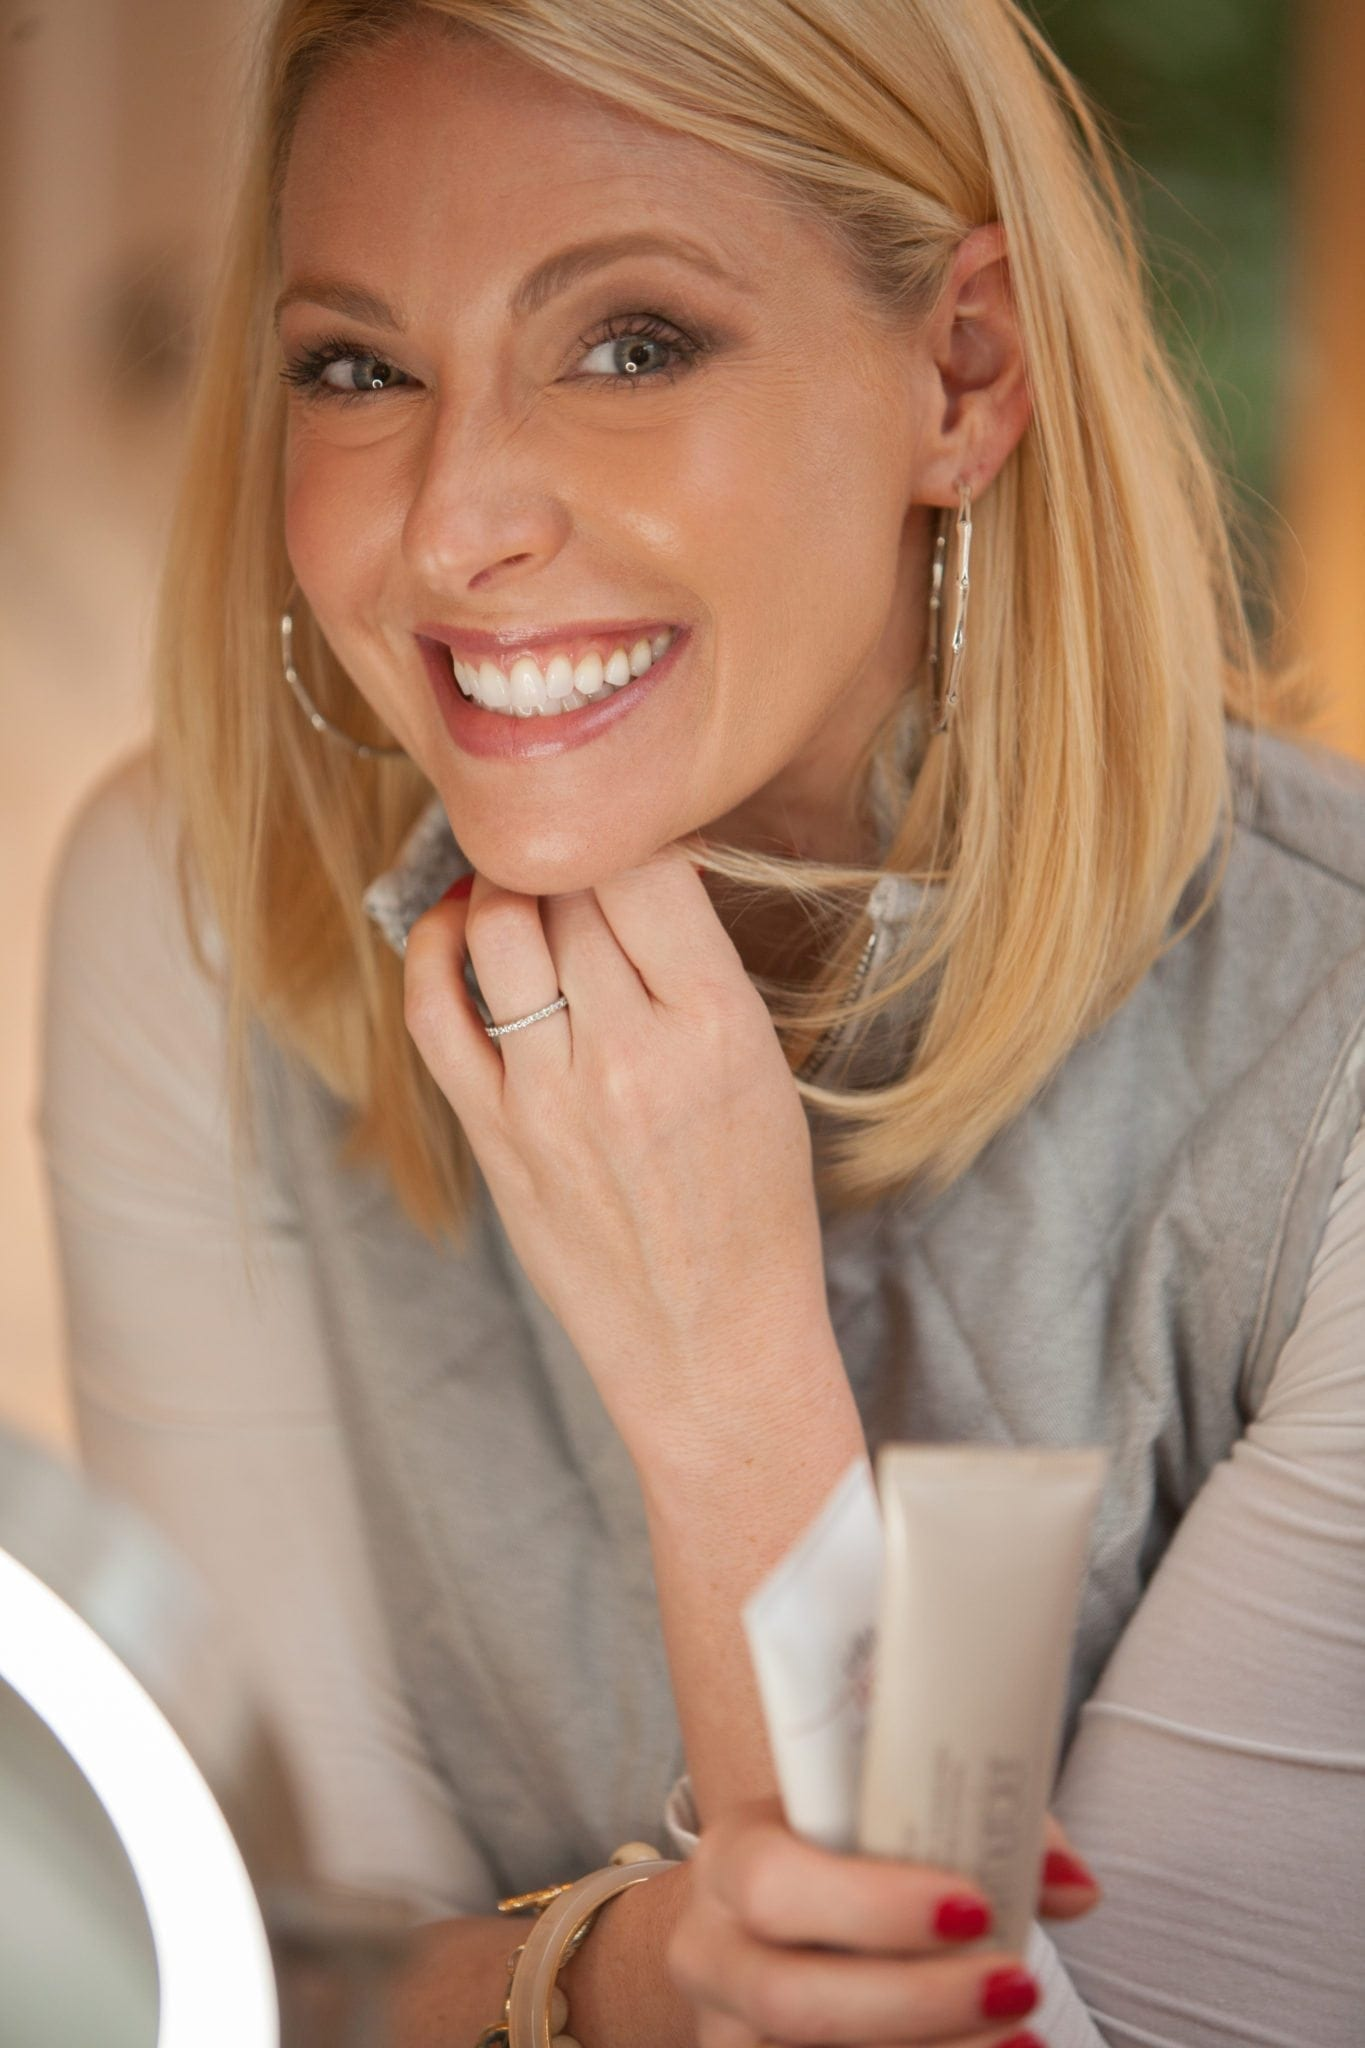 How to wear tinted moisturizer under foundation.